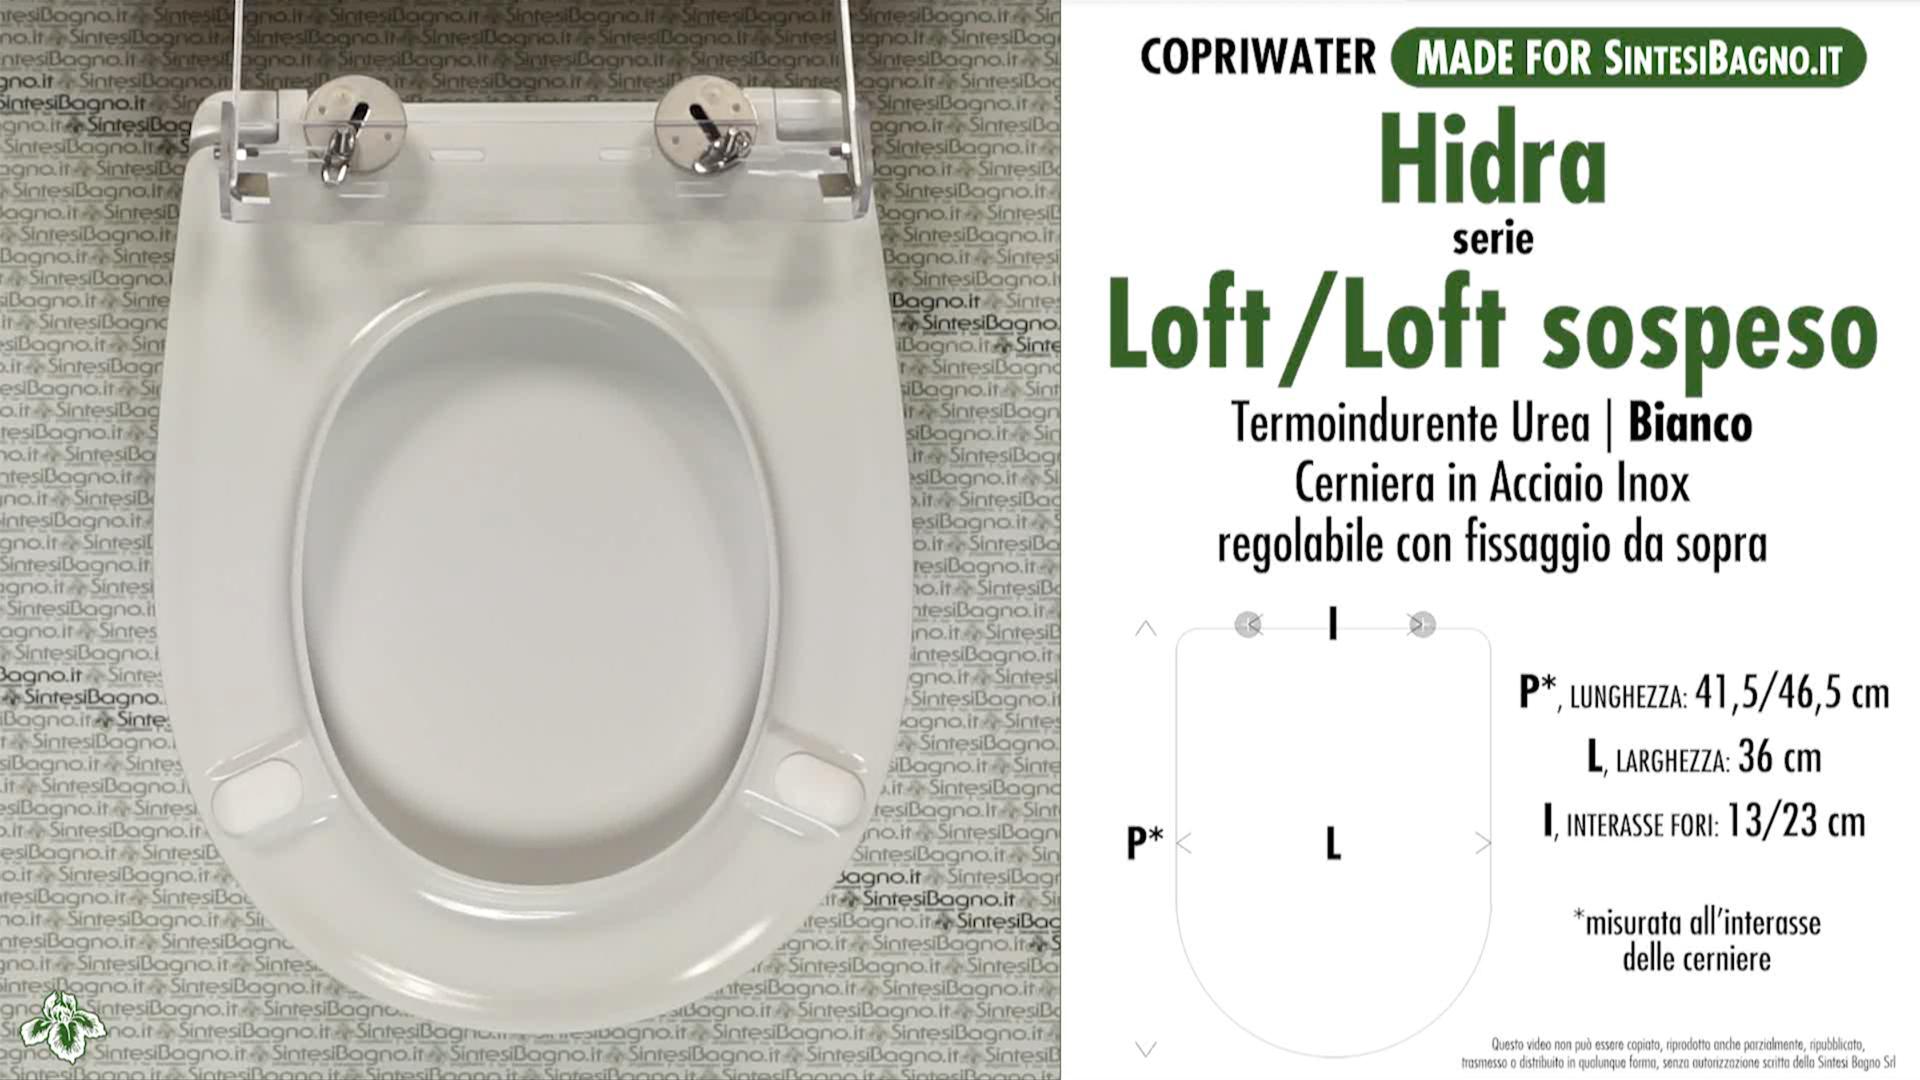 SCHEDA TECNICA MISURE copriwater HIDRA LOFT